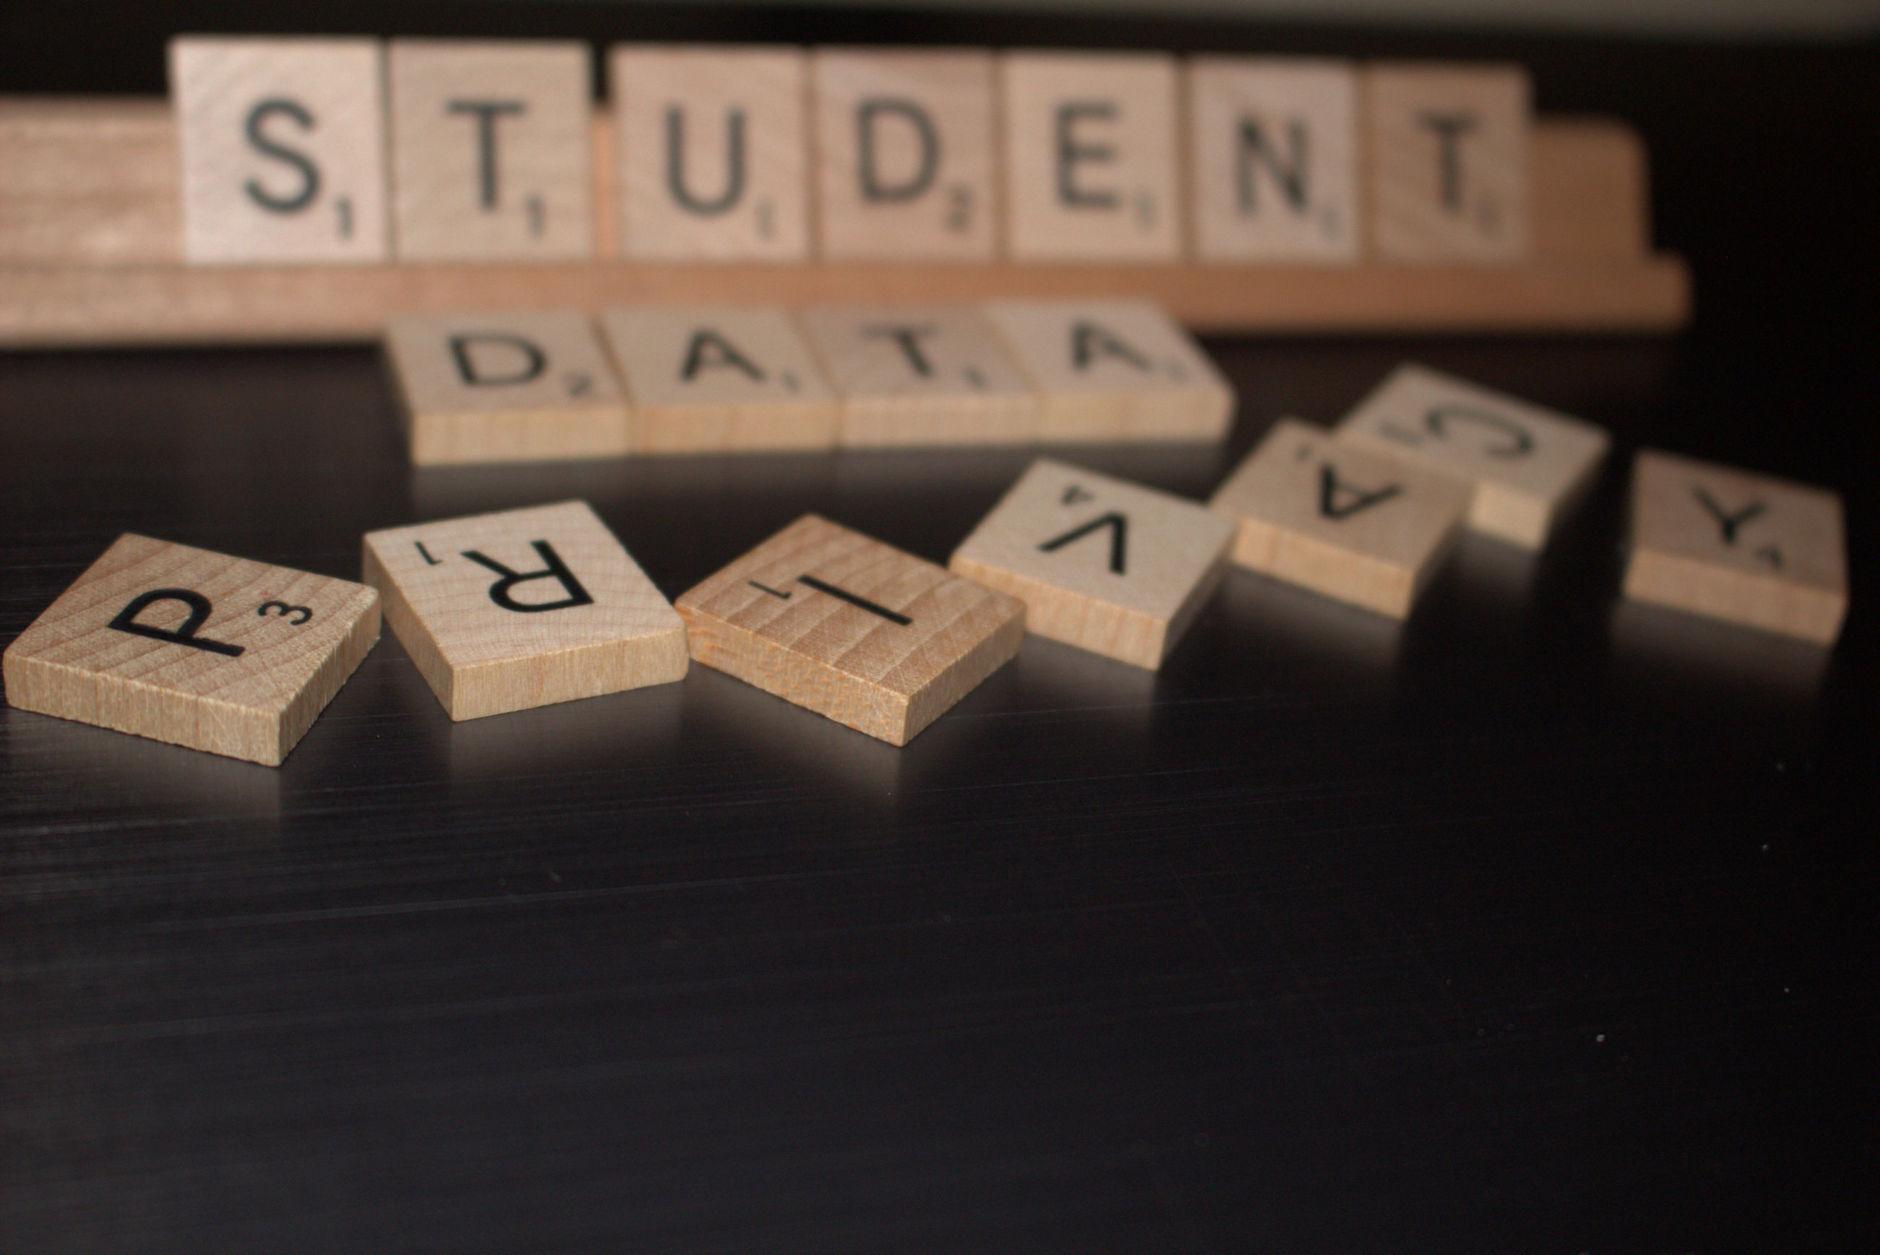 StudentDataPrivacy